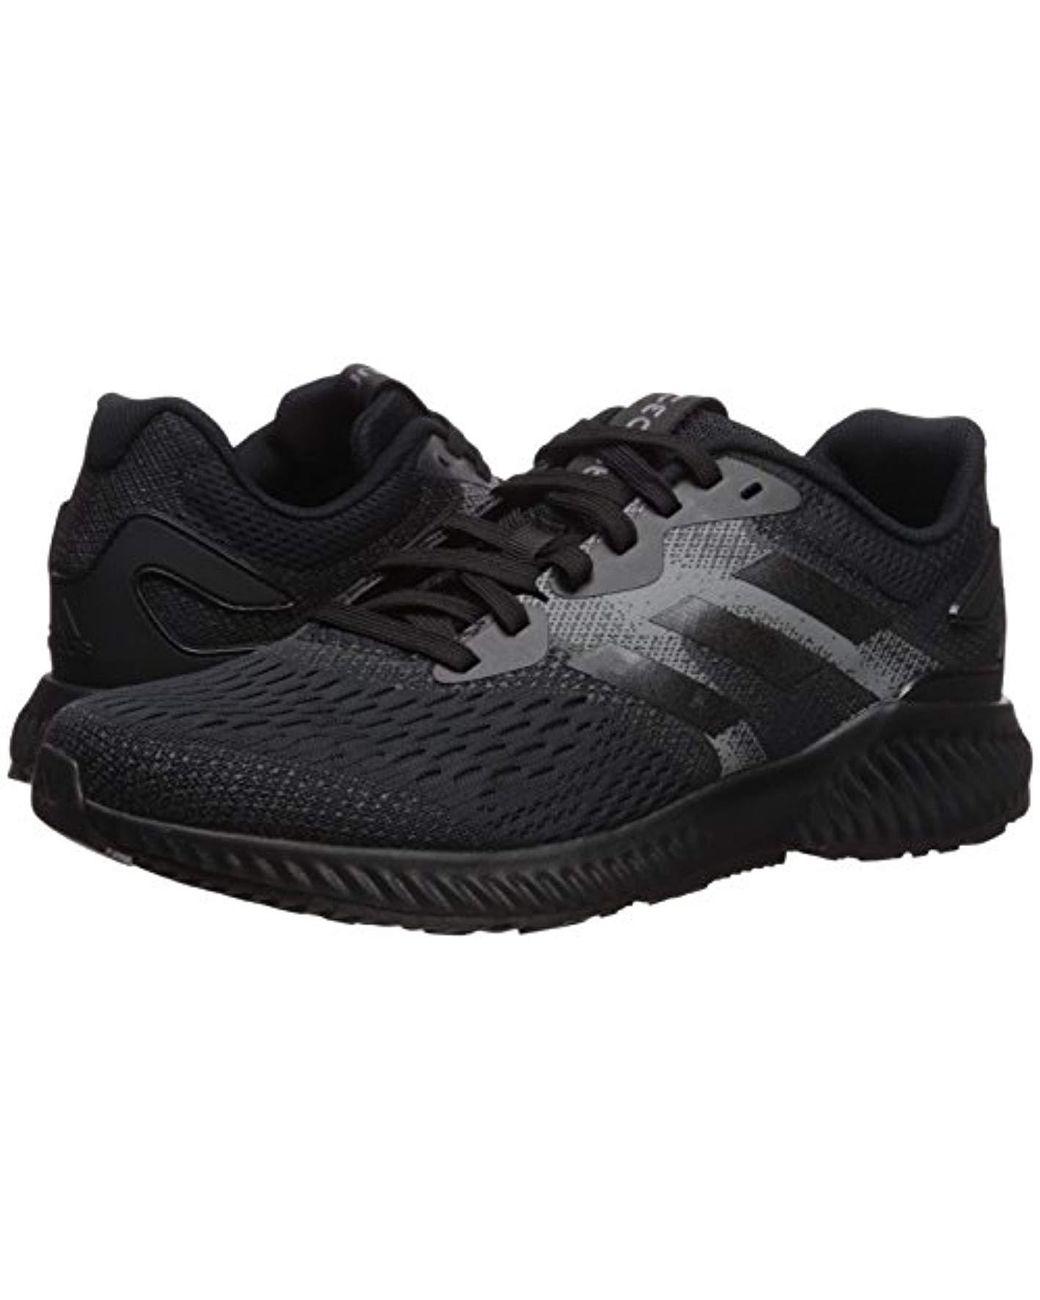 sports shoes b4355 34191 Men's Black Aerobounce M Running Shoe